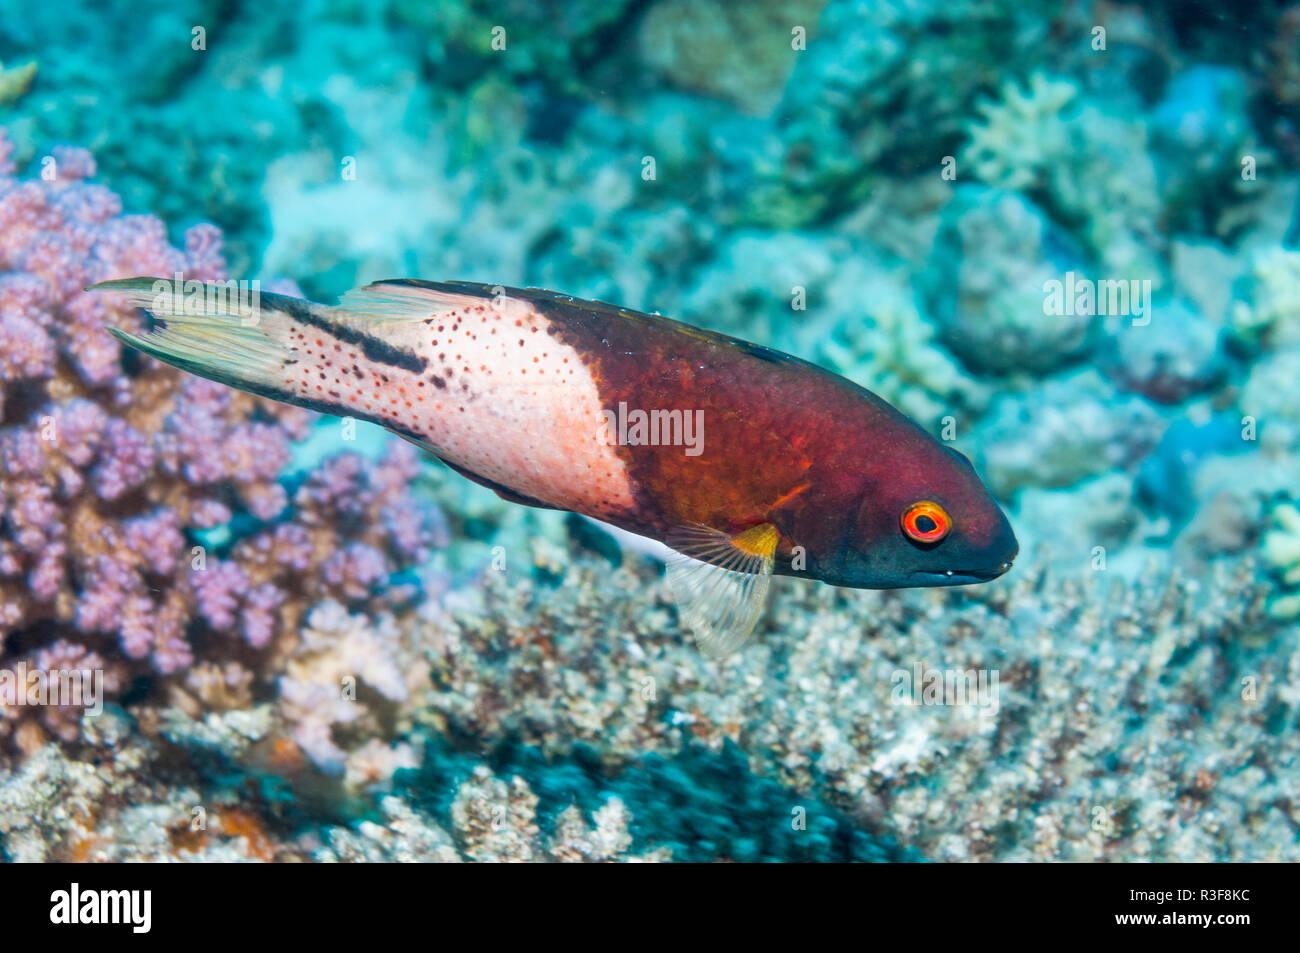 Lyretail hogfish [Bodianus anthioides],  Egypt, Red Sea. - Stock Image